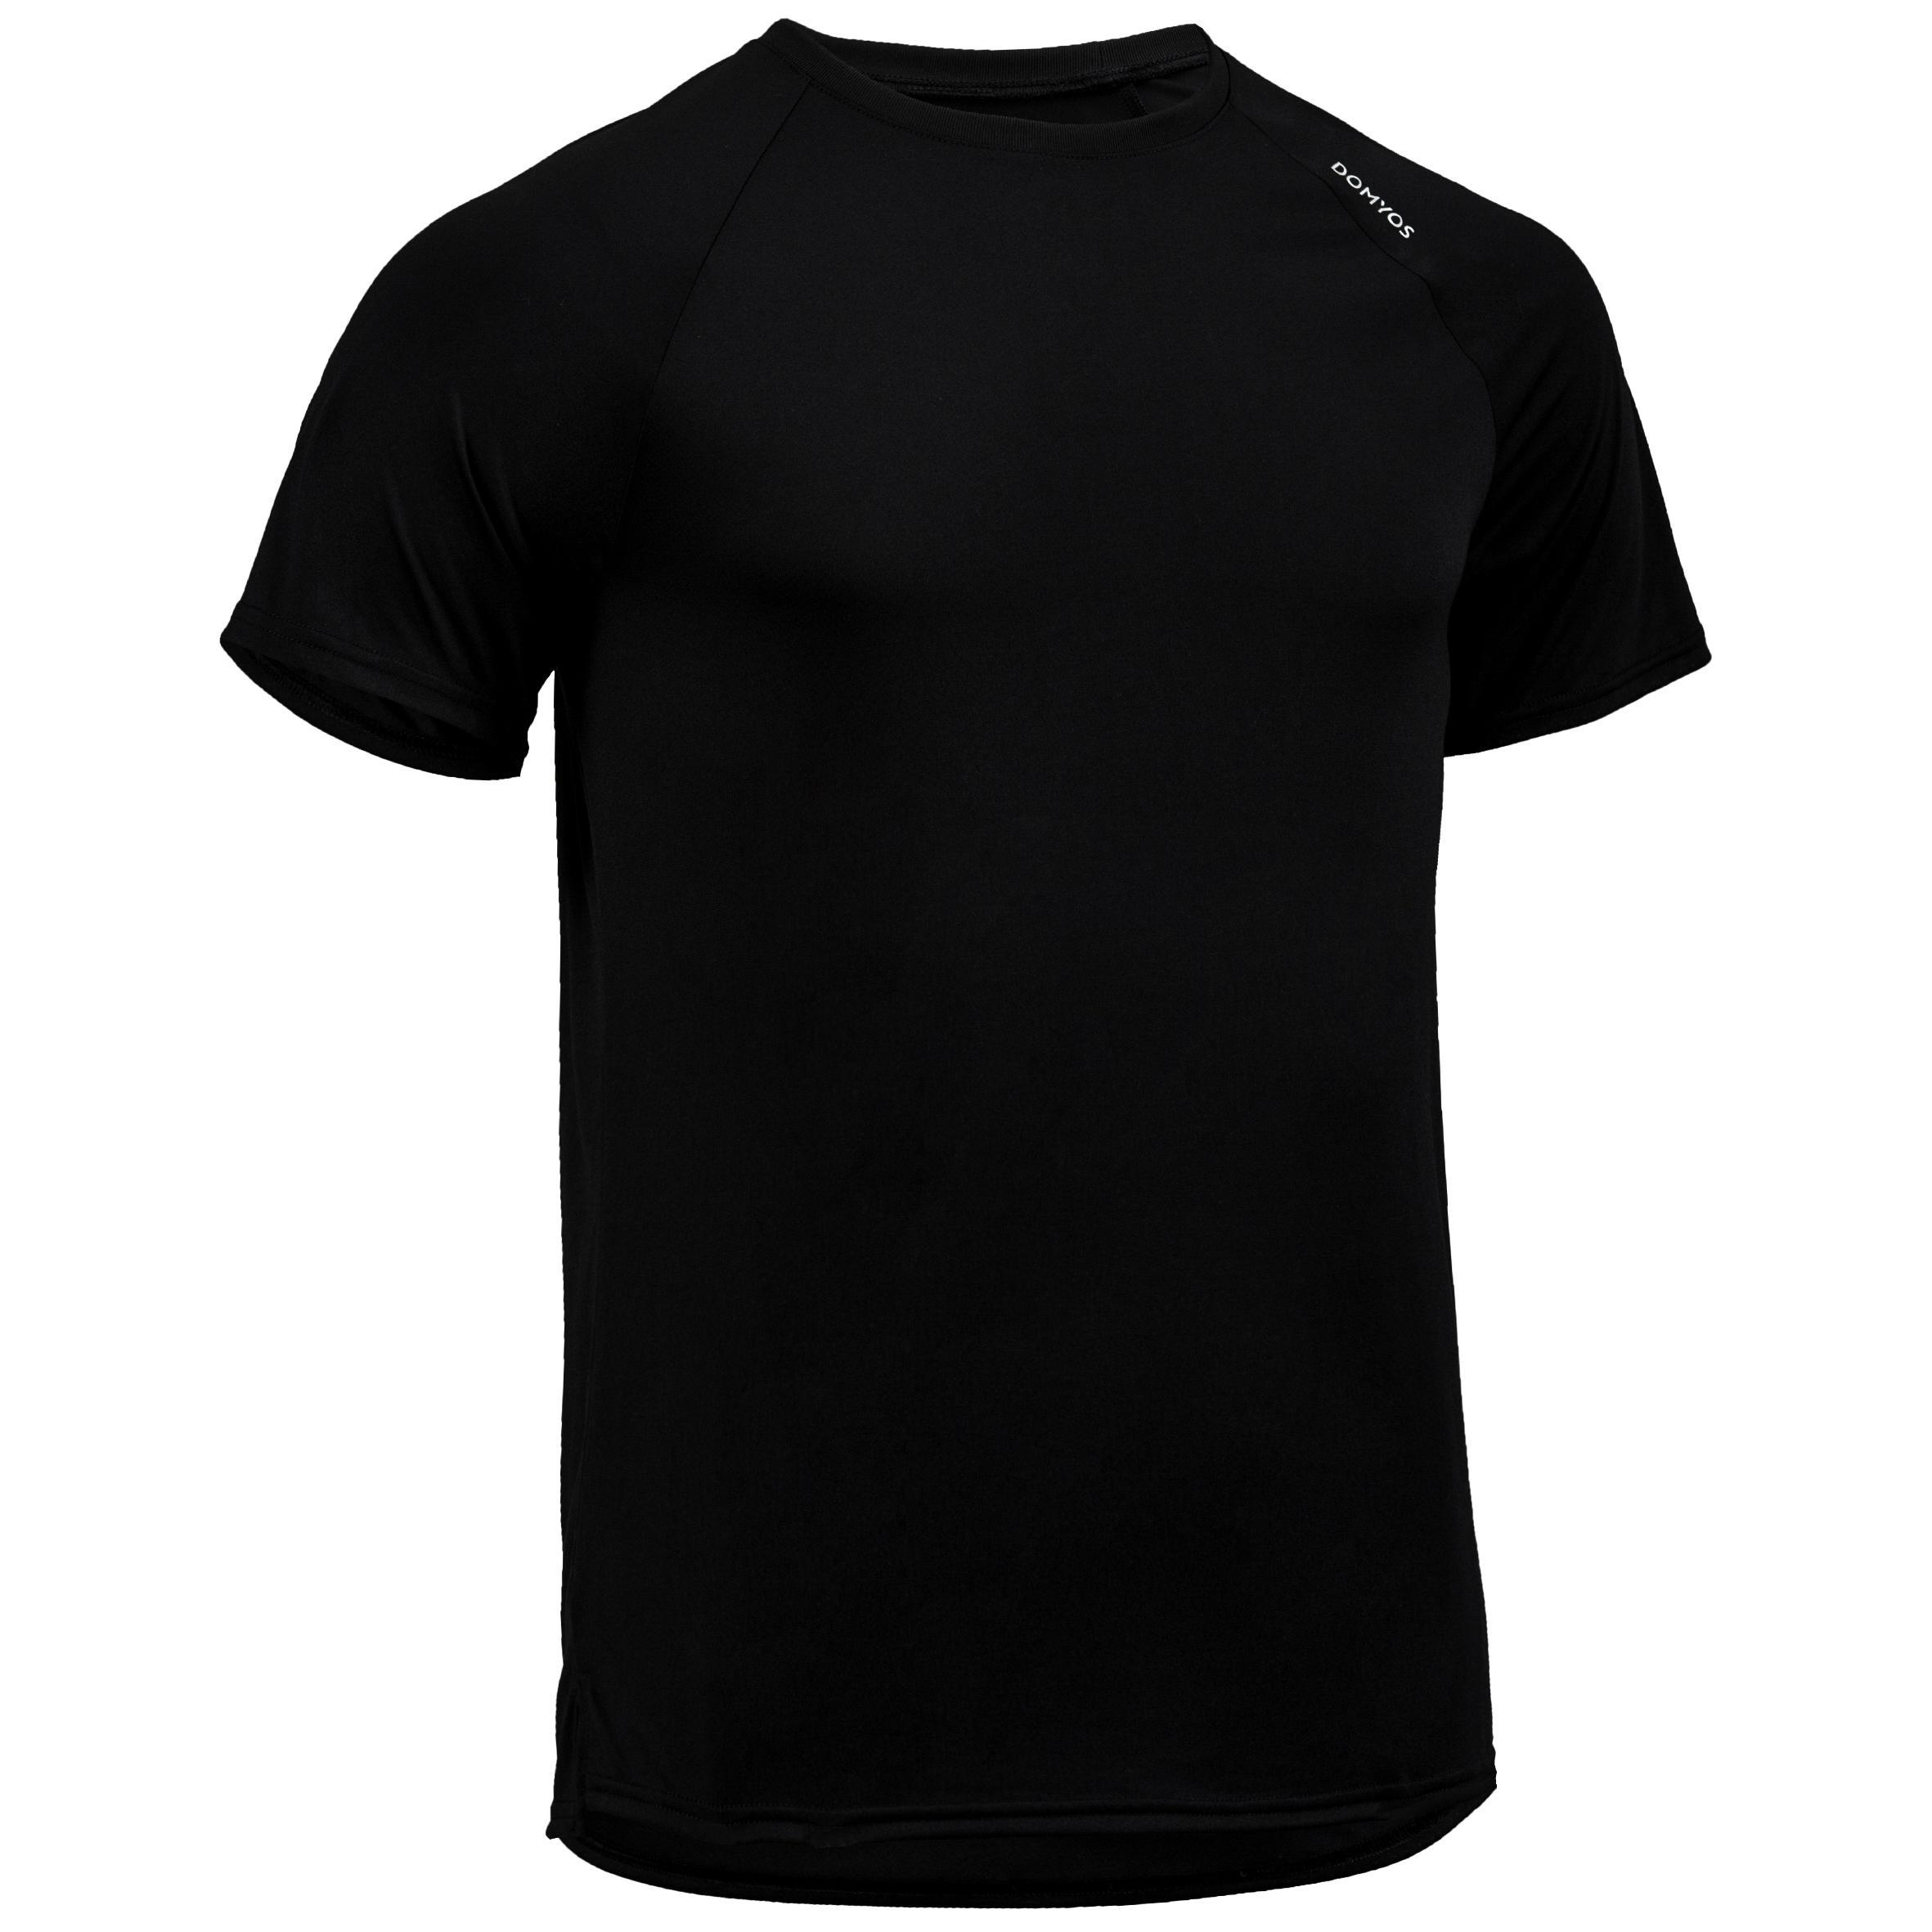 T-Shirt FTS 100 Fitness-/Cardiotraining Herren schwarz | Sportbekleidung > Sportshirts > Poloshirts | Schwarz | Domyos